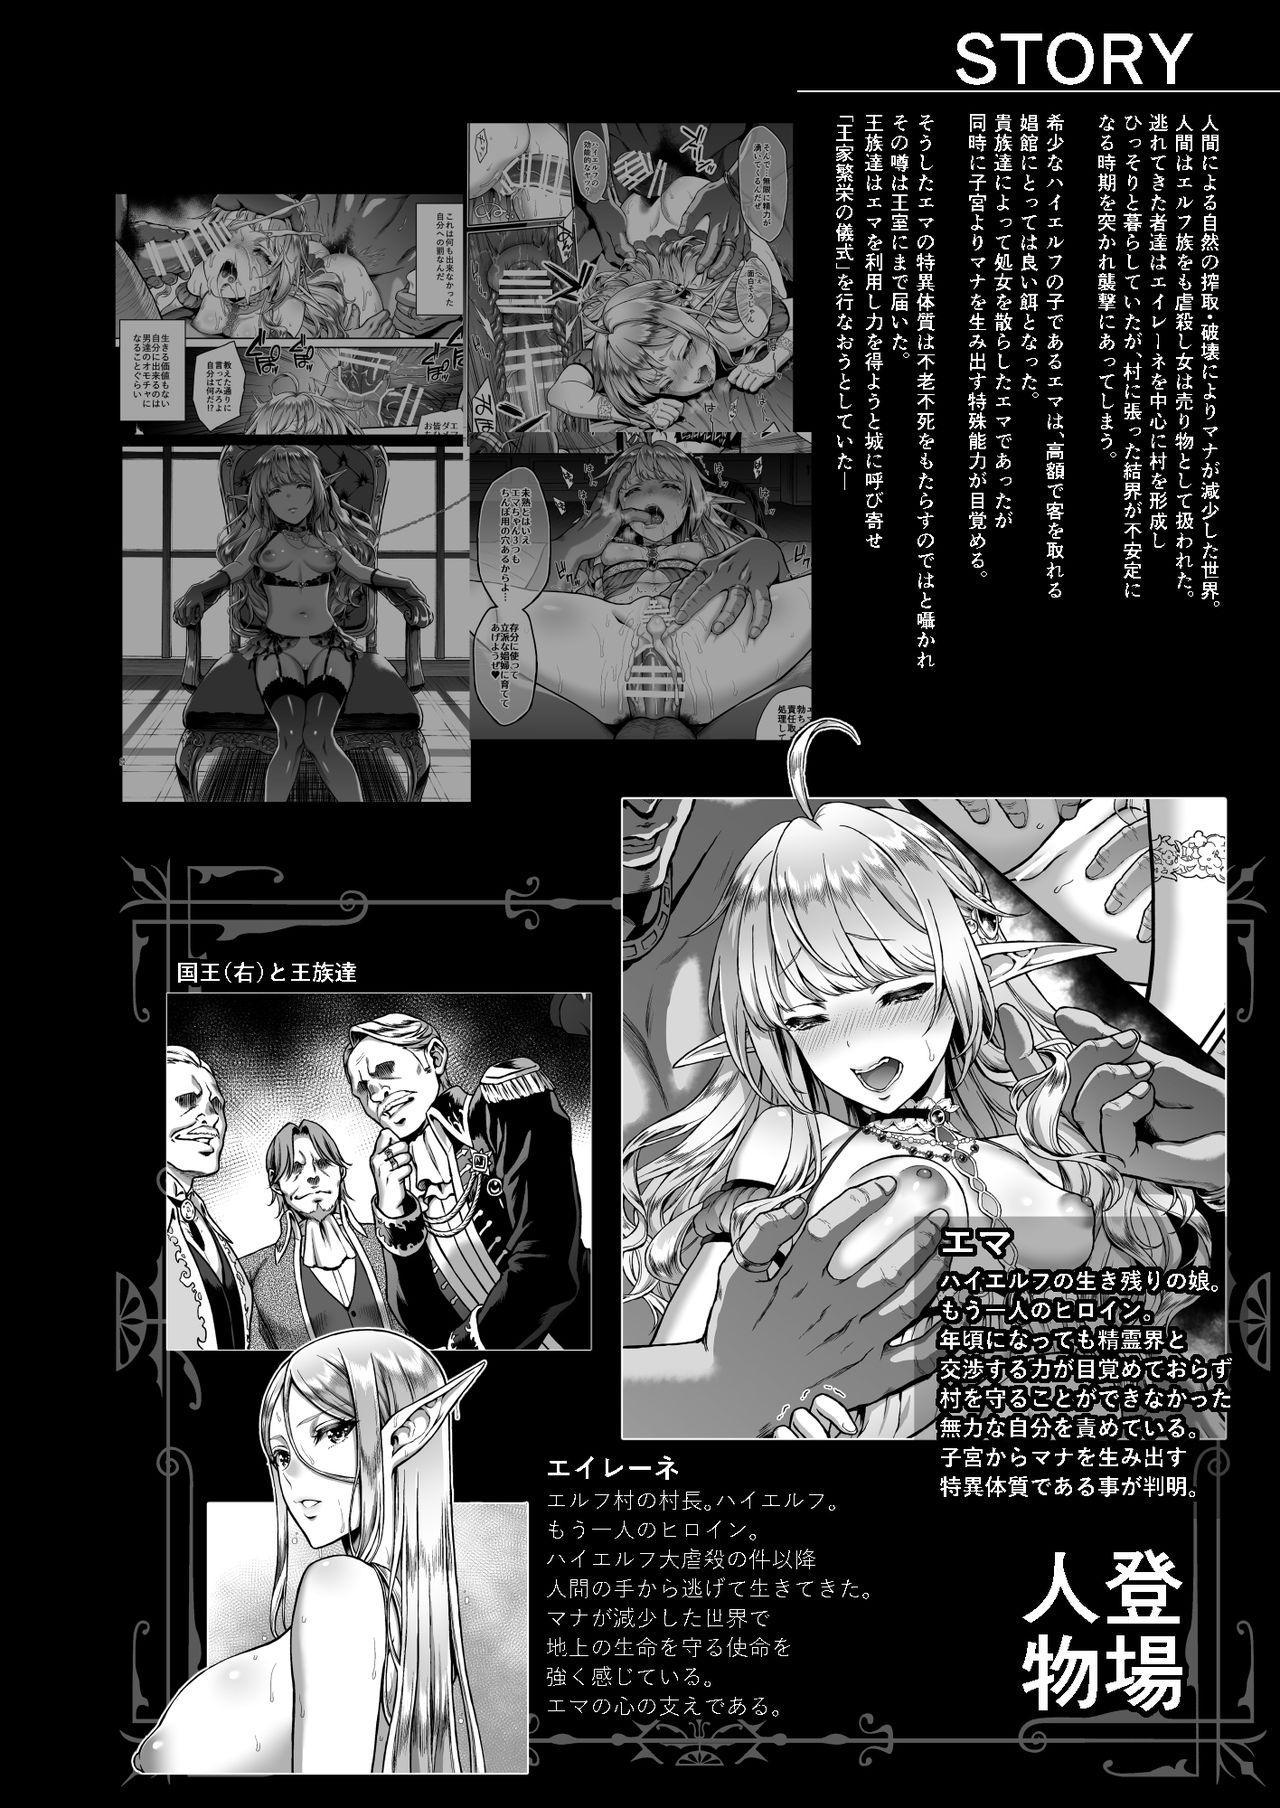 Tasogare no Shou Elf 6 - The story of Emma's side 1